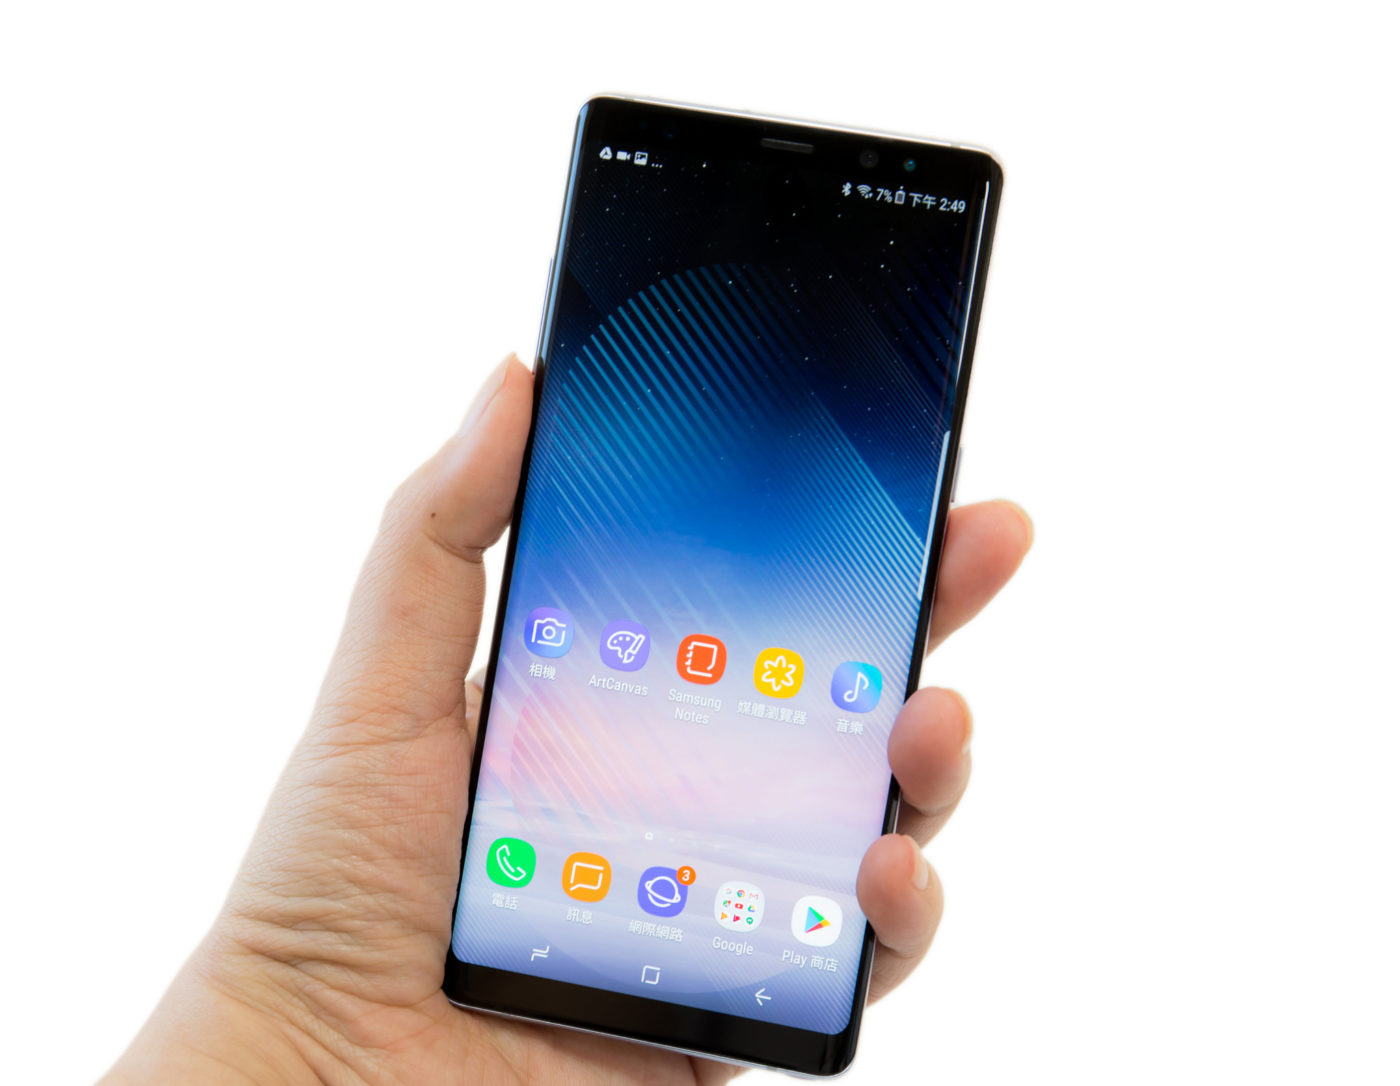 Galaxy Note 8 效能電力實測!同場加映 S8 / U11 / XZP 比較彙整 @3C 達人廖阿輝